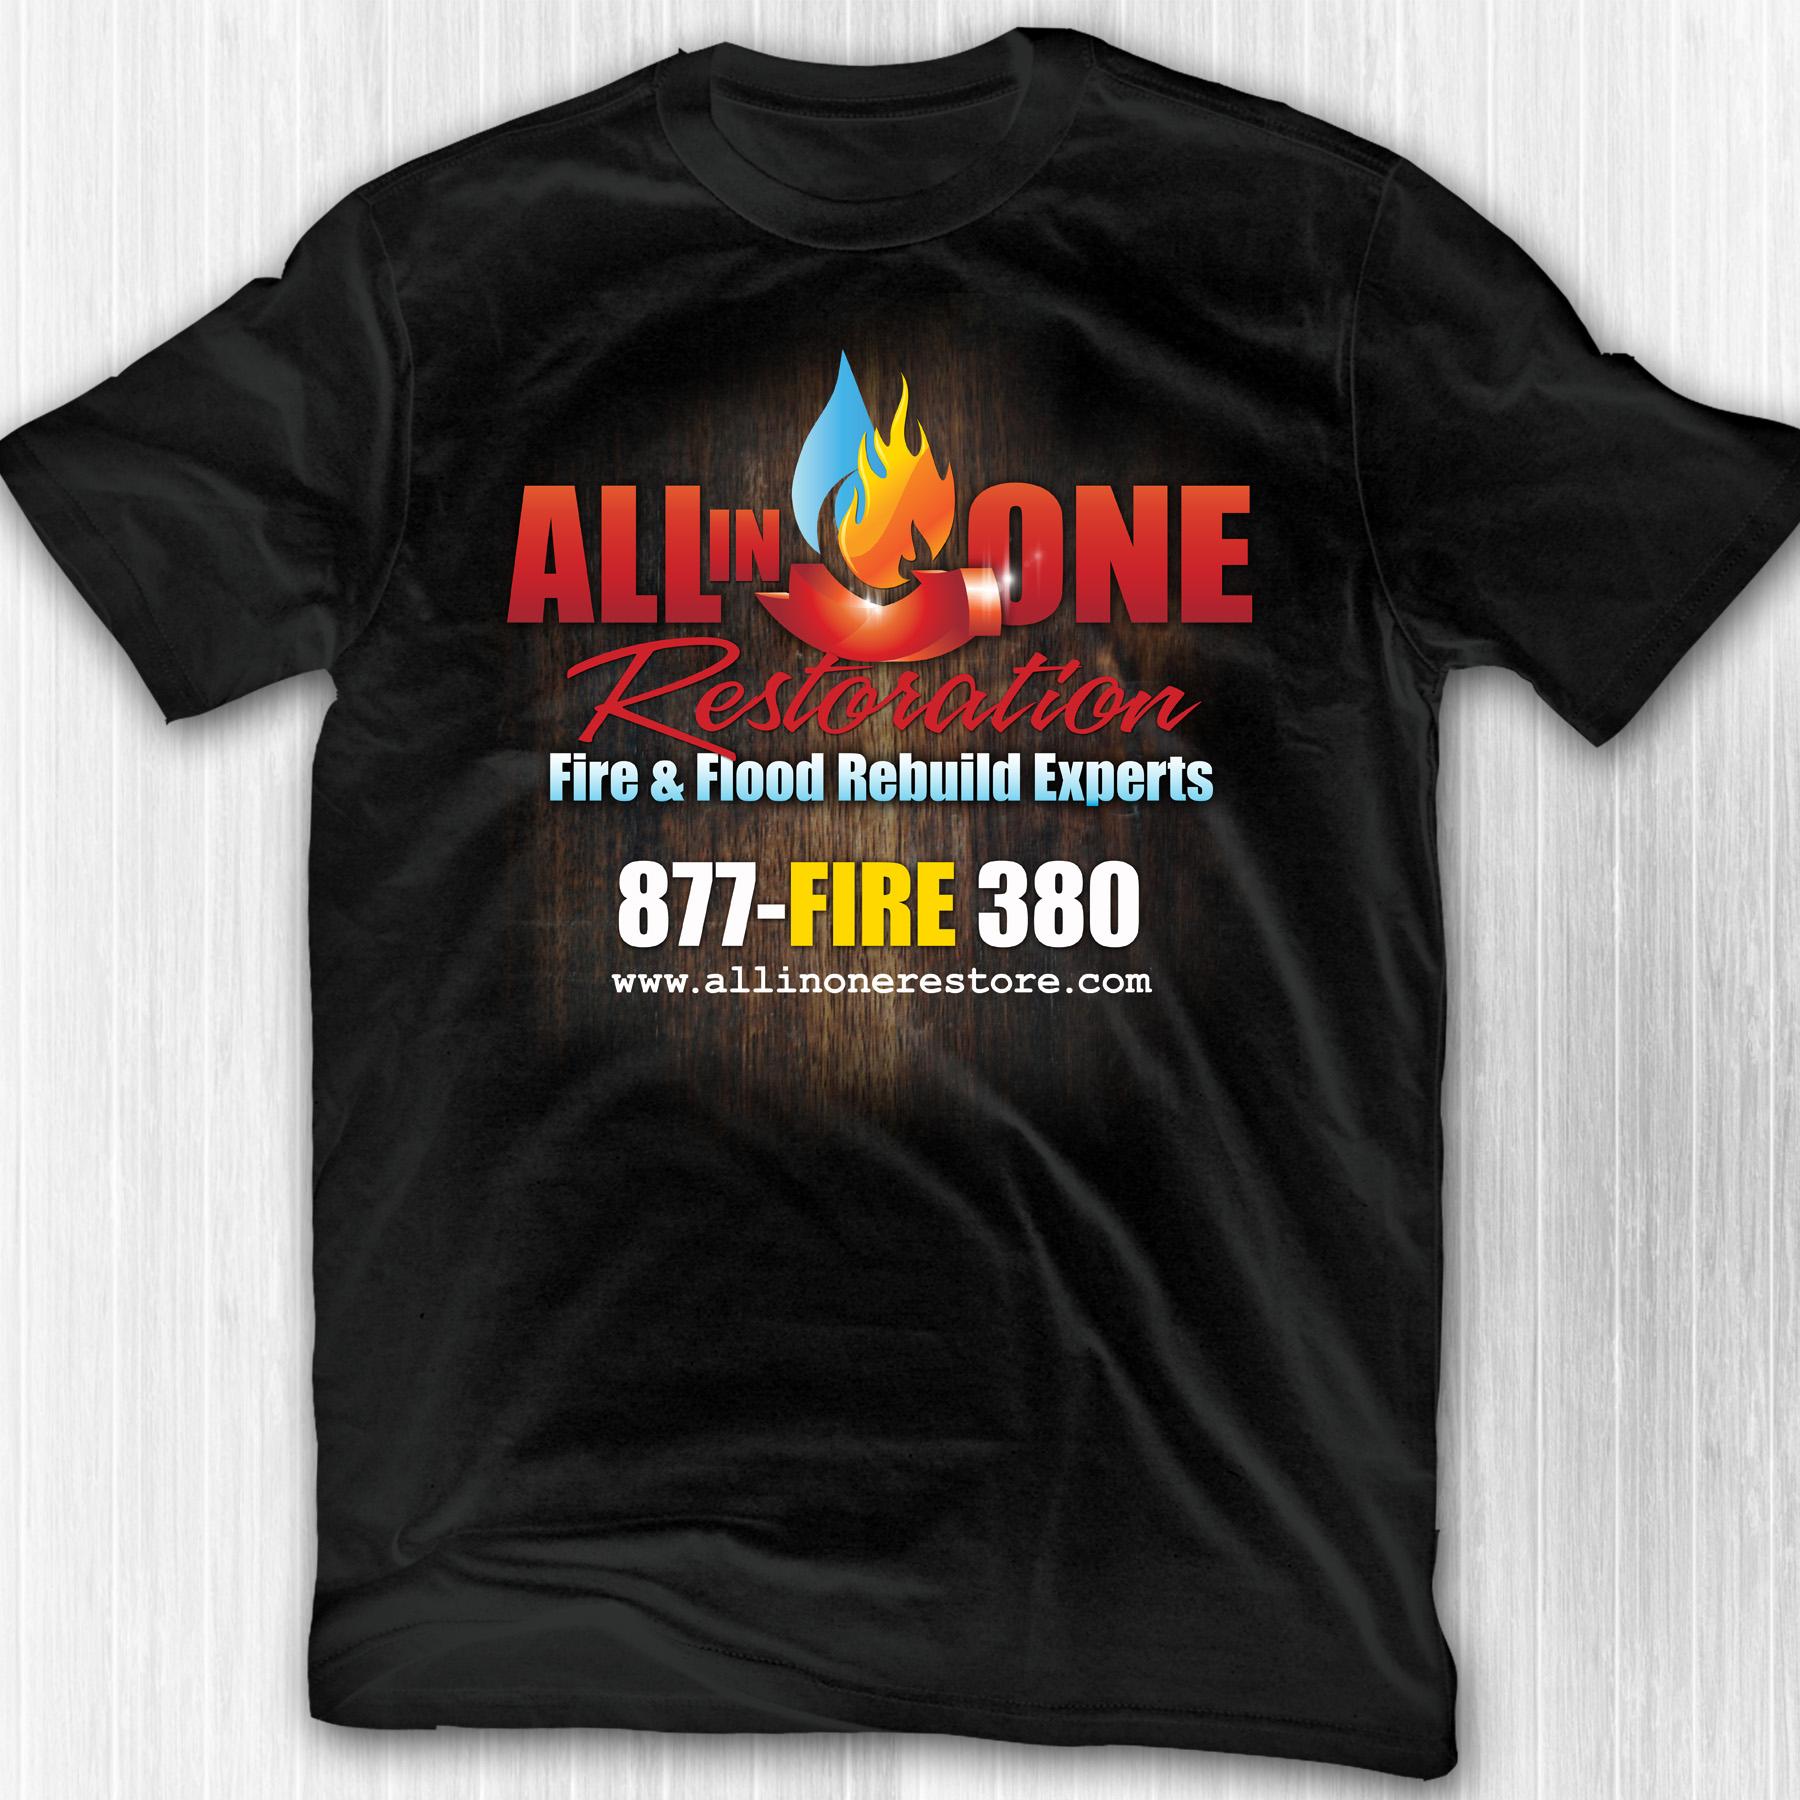 Allinone shirt